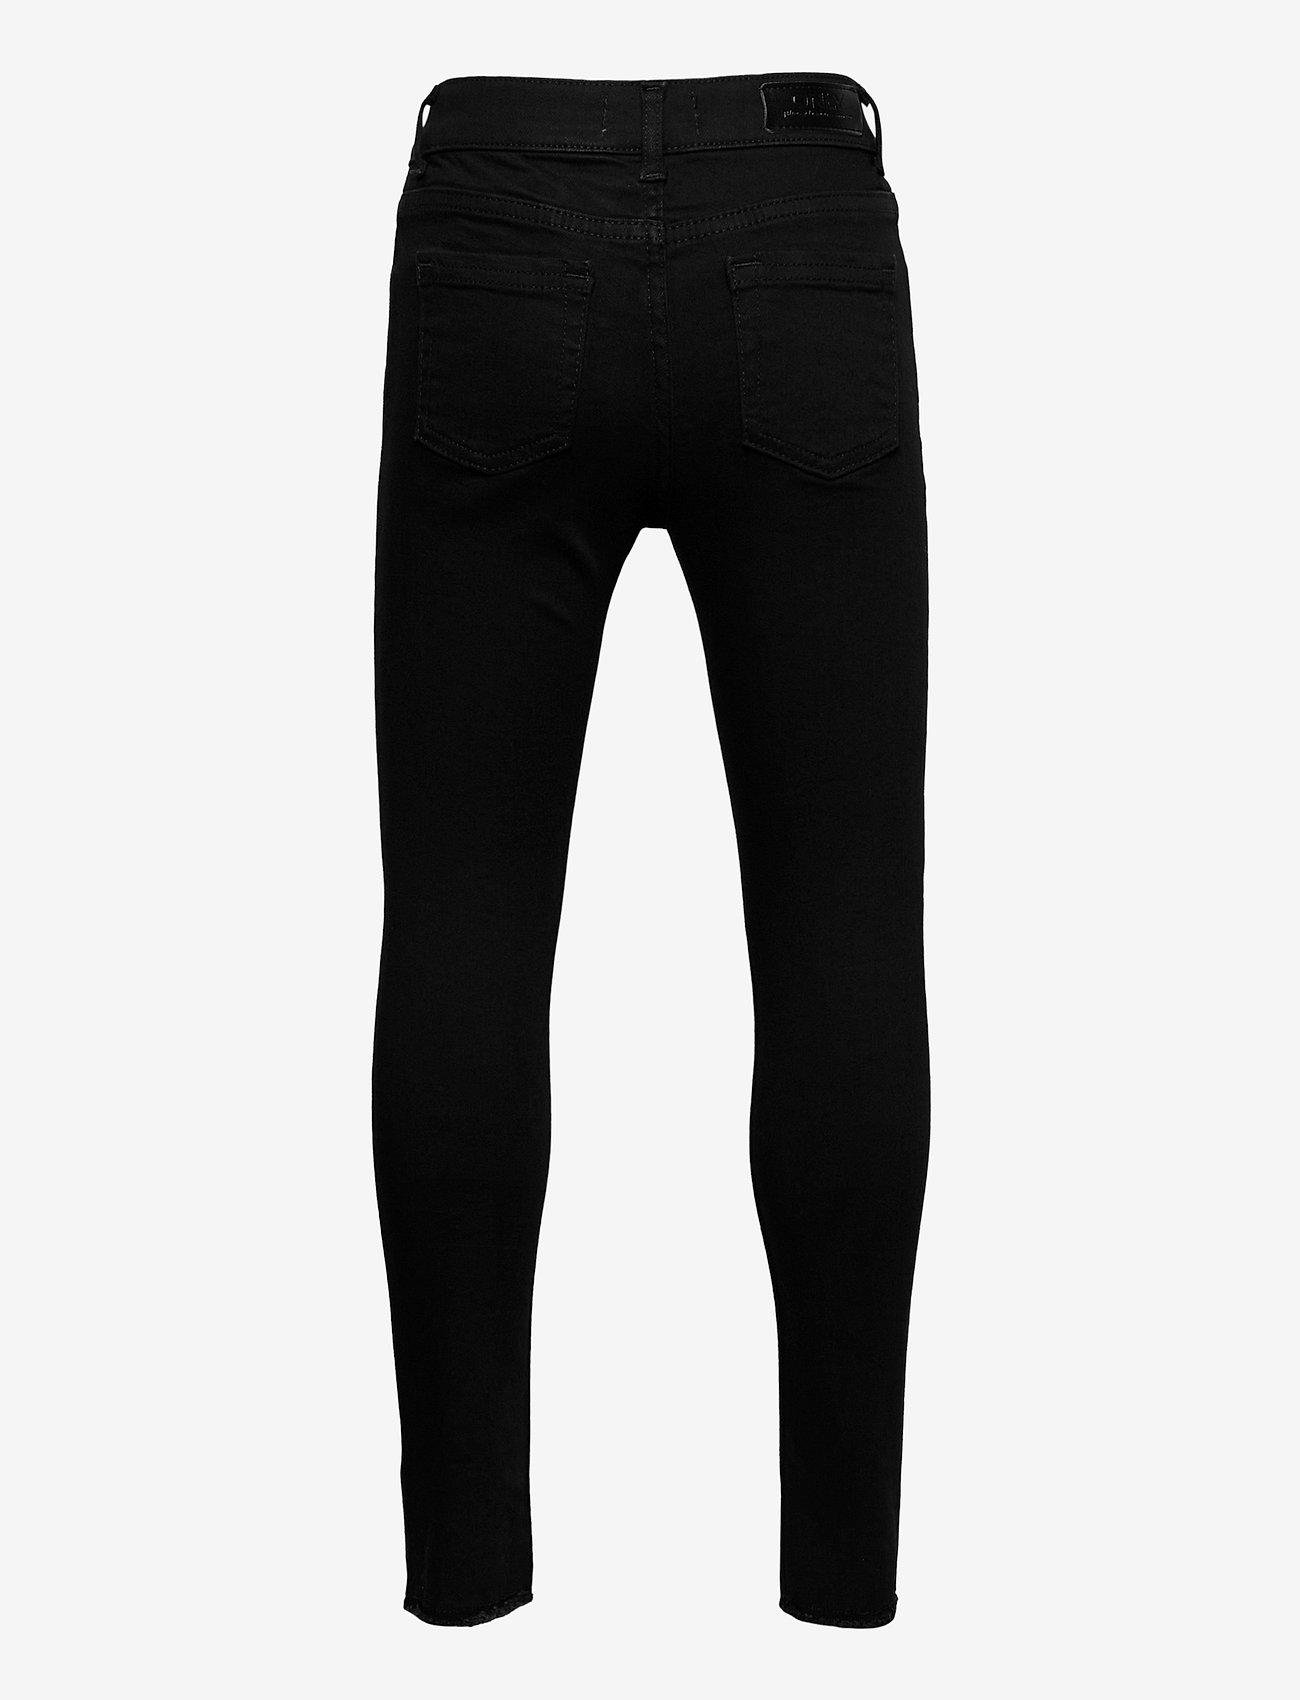 Kids Only - KONBLUSH SKINNY JEANS 2343 - jeans - black denim - 1